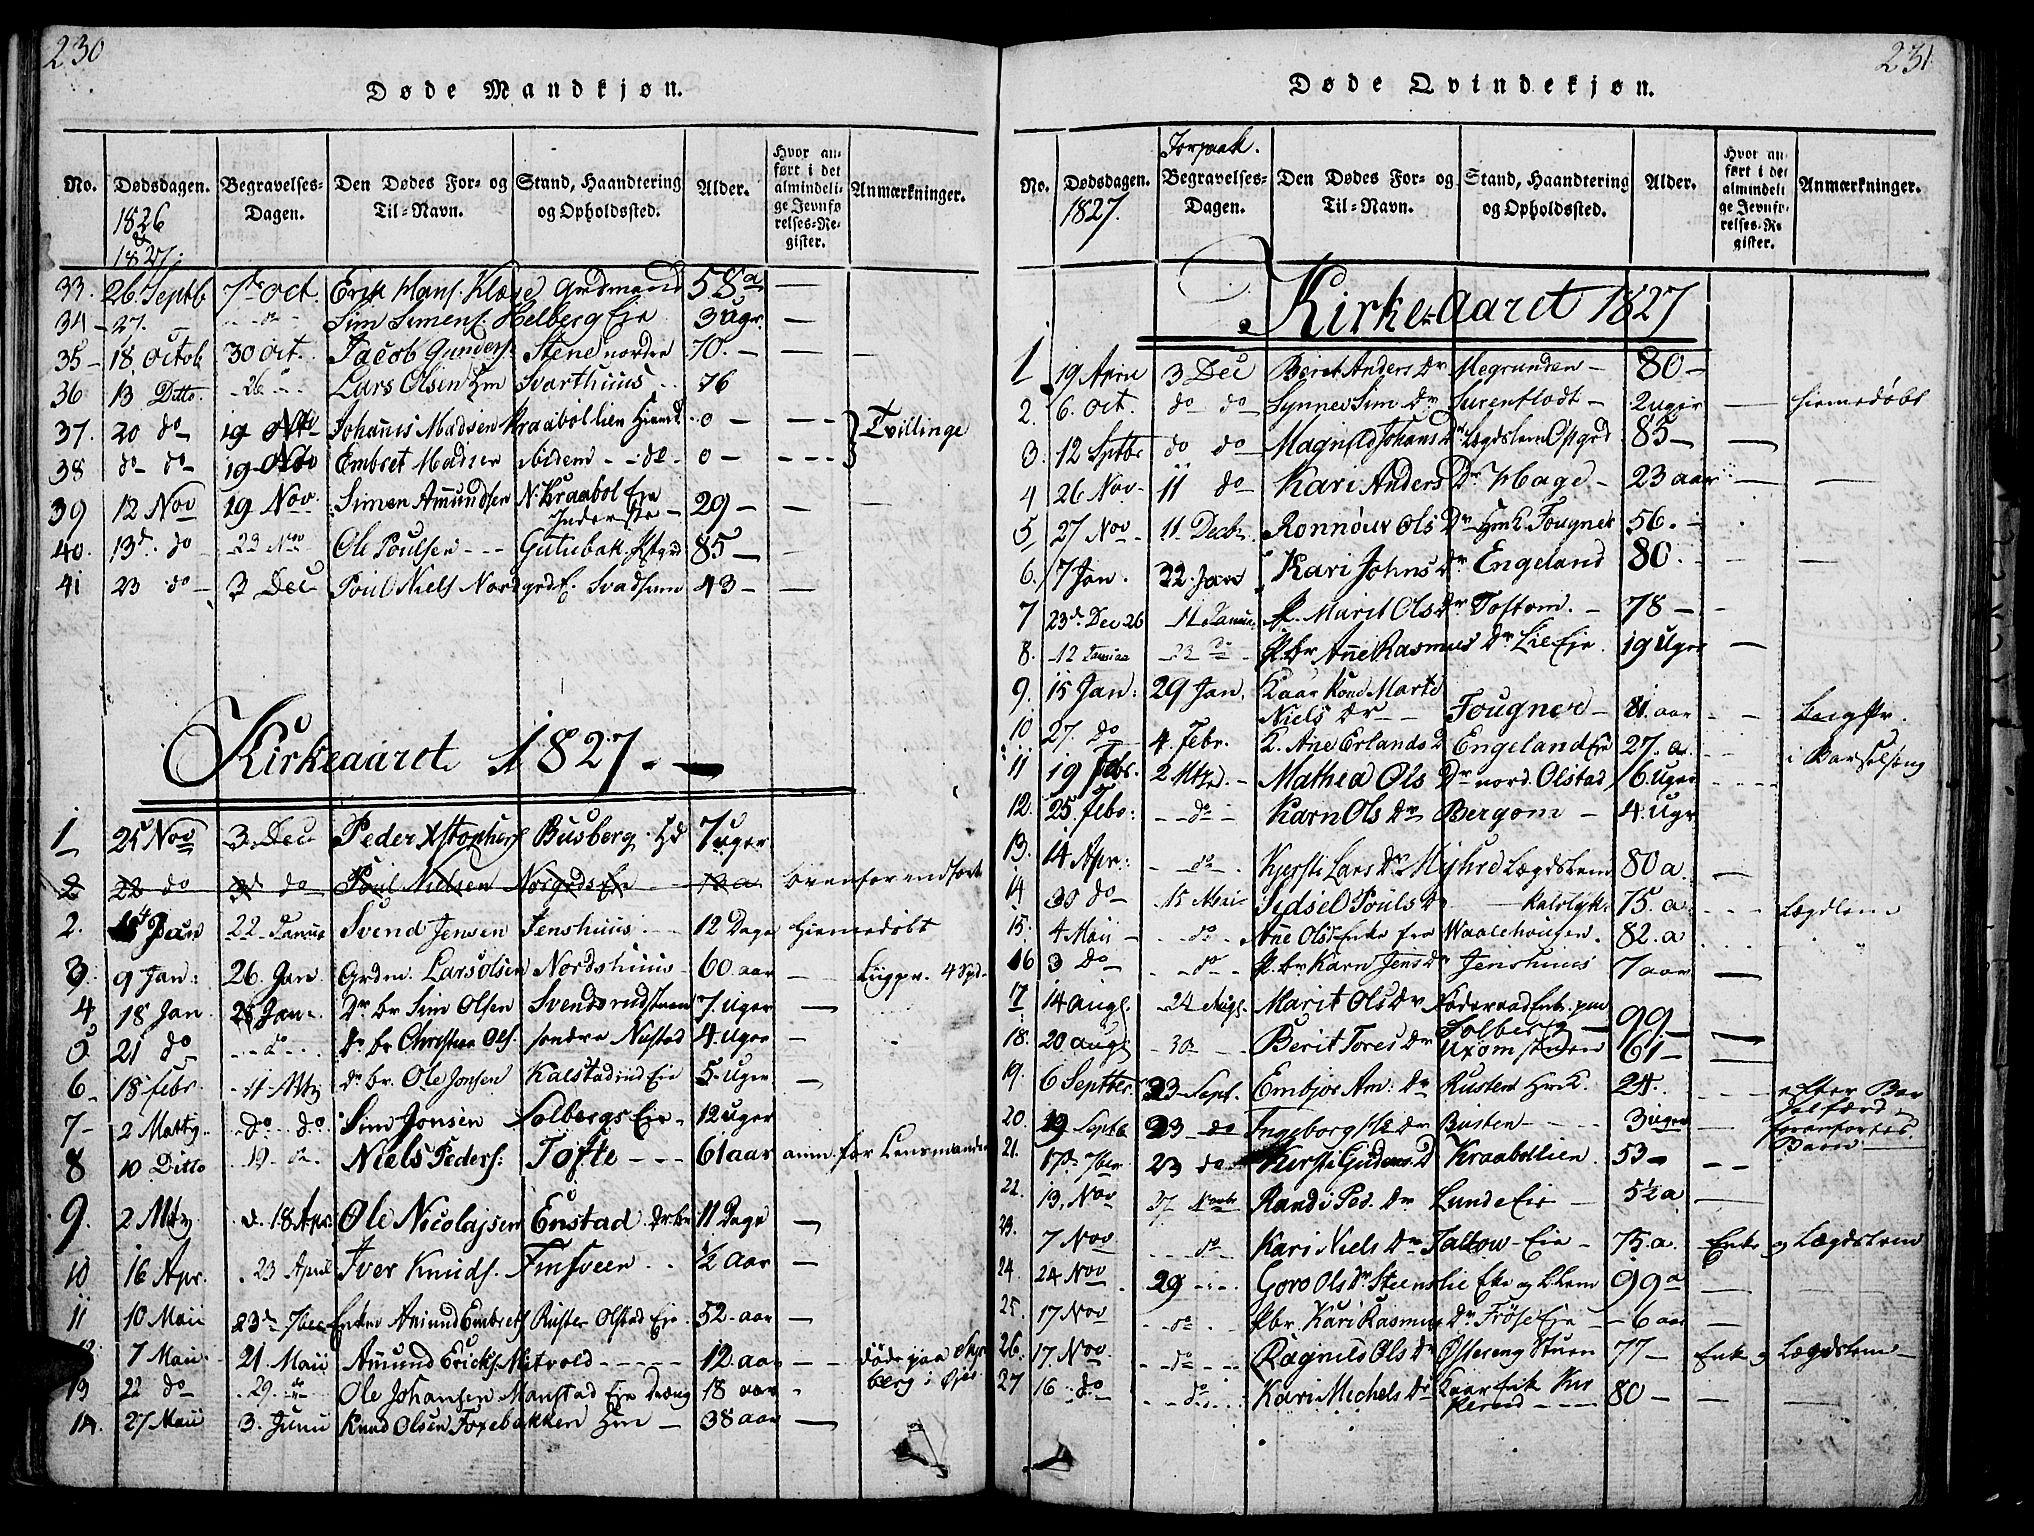 SAH, Gausdal prestekontor, Ministerialbok nr. 5, 1817-1829, s. 230-231